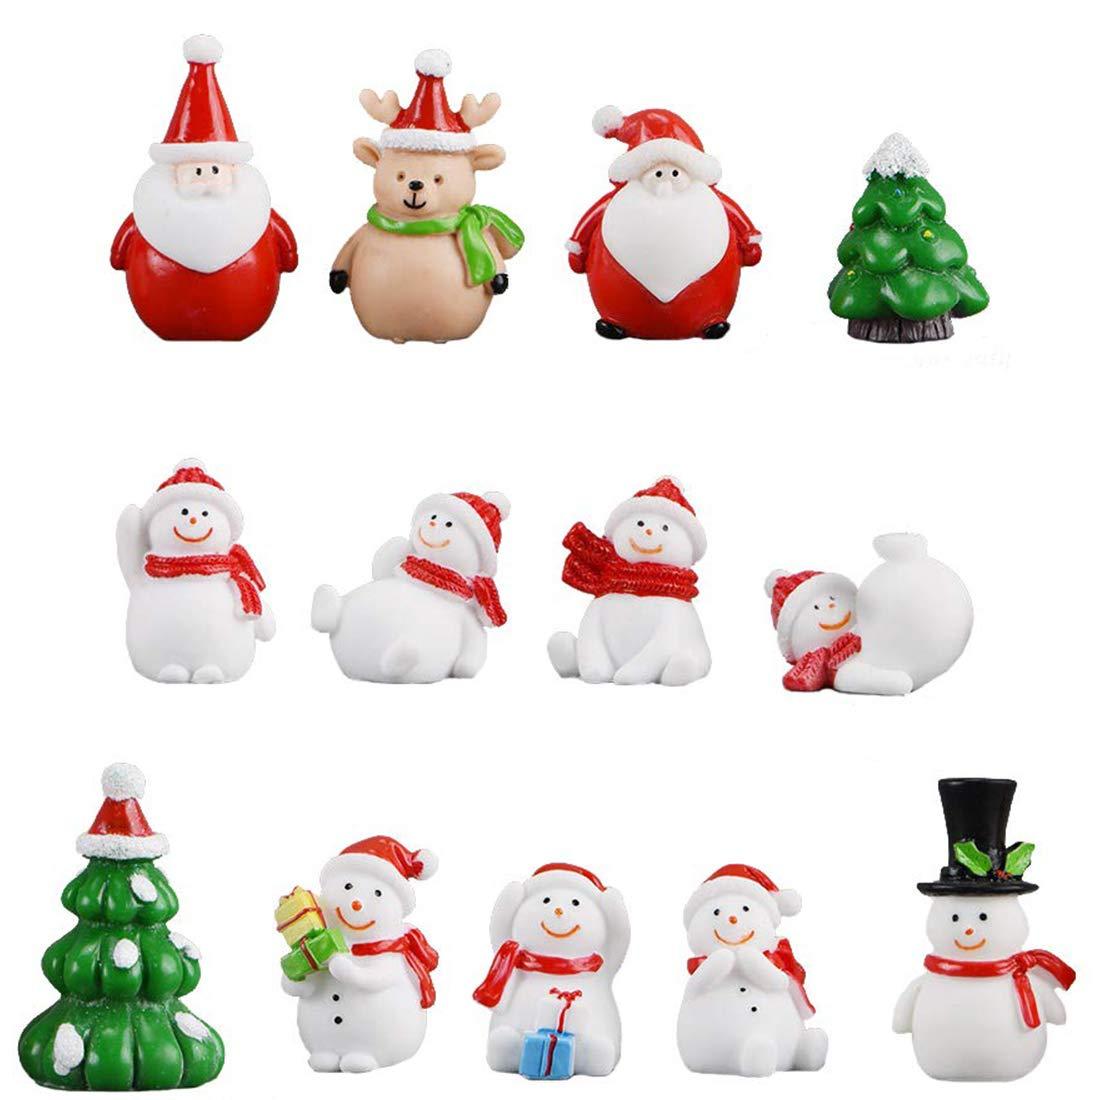 13 Piece Christmas Theme Resin Miniature Garden Figurines Mini Ornaments Set Fairy Garden Dollhouse Decoration Christmas Decoration Ornaments Home Table Decoration Landscape DIY Accessory